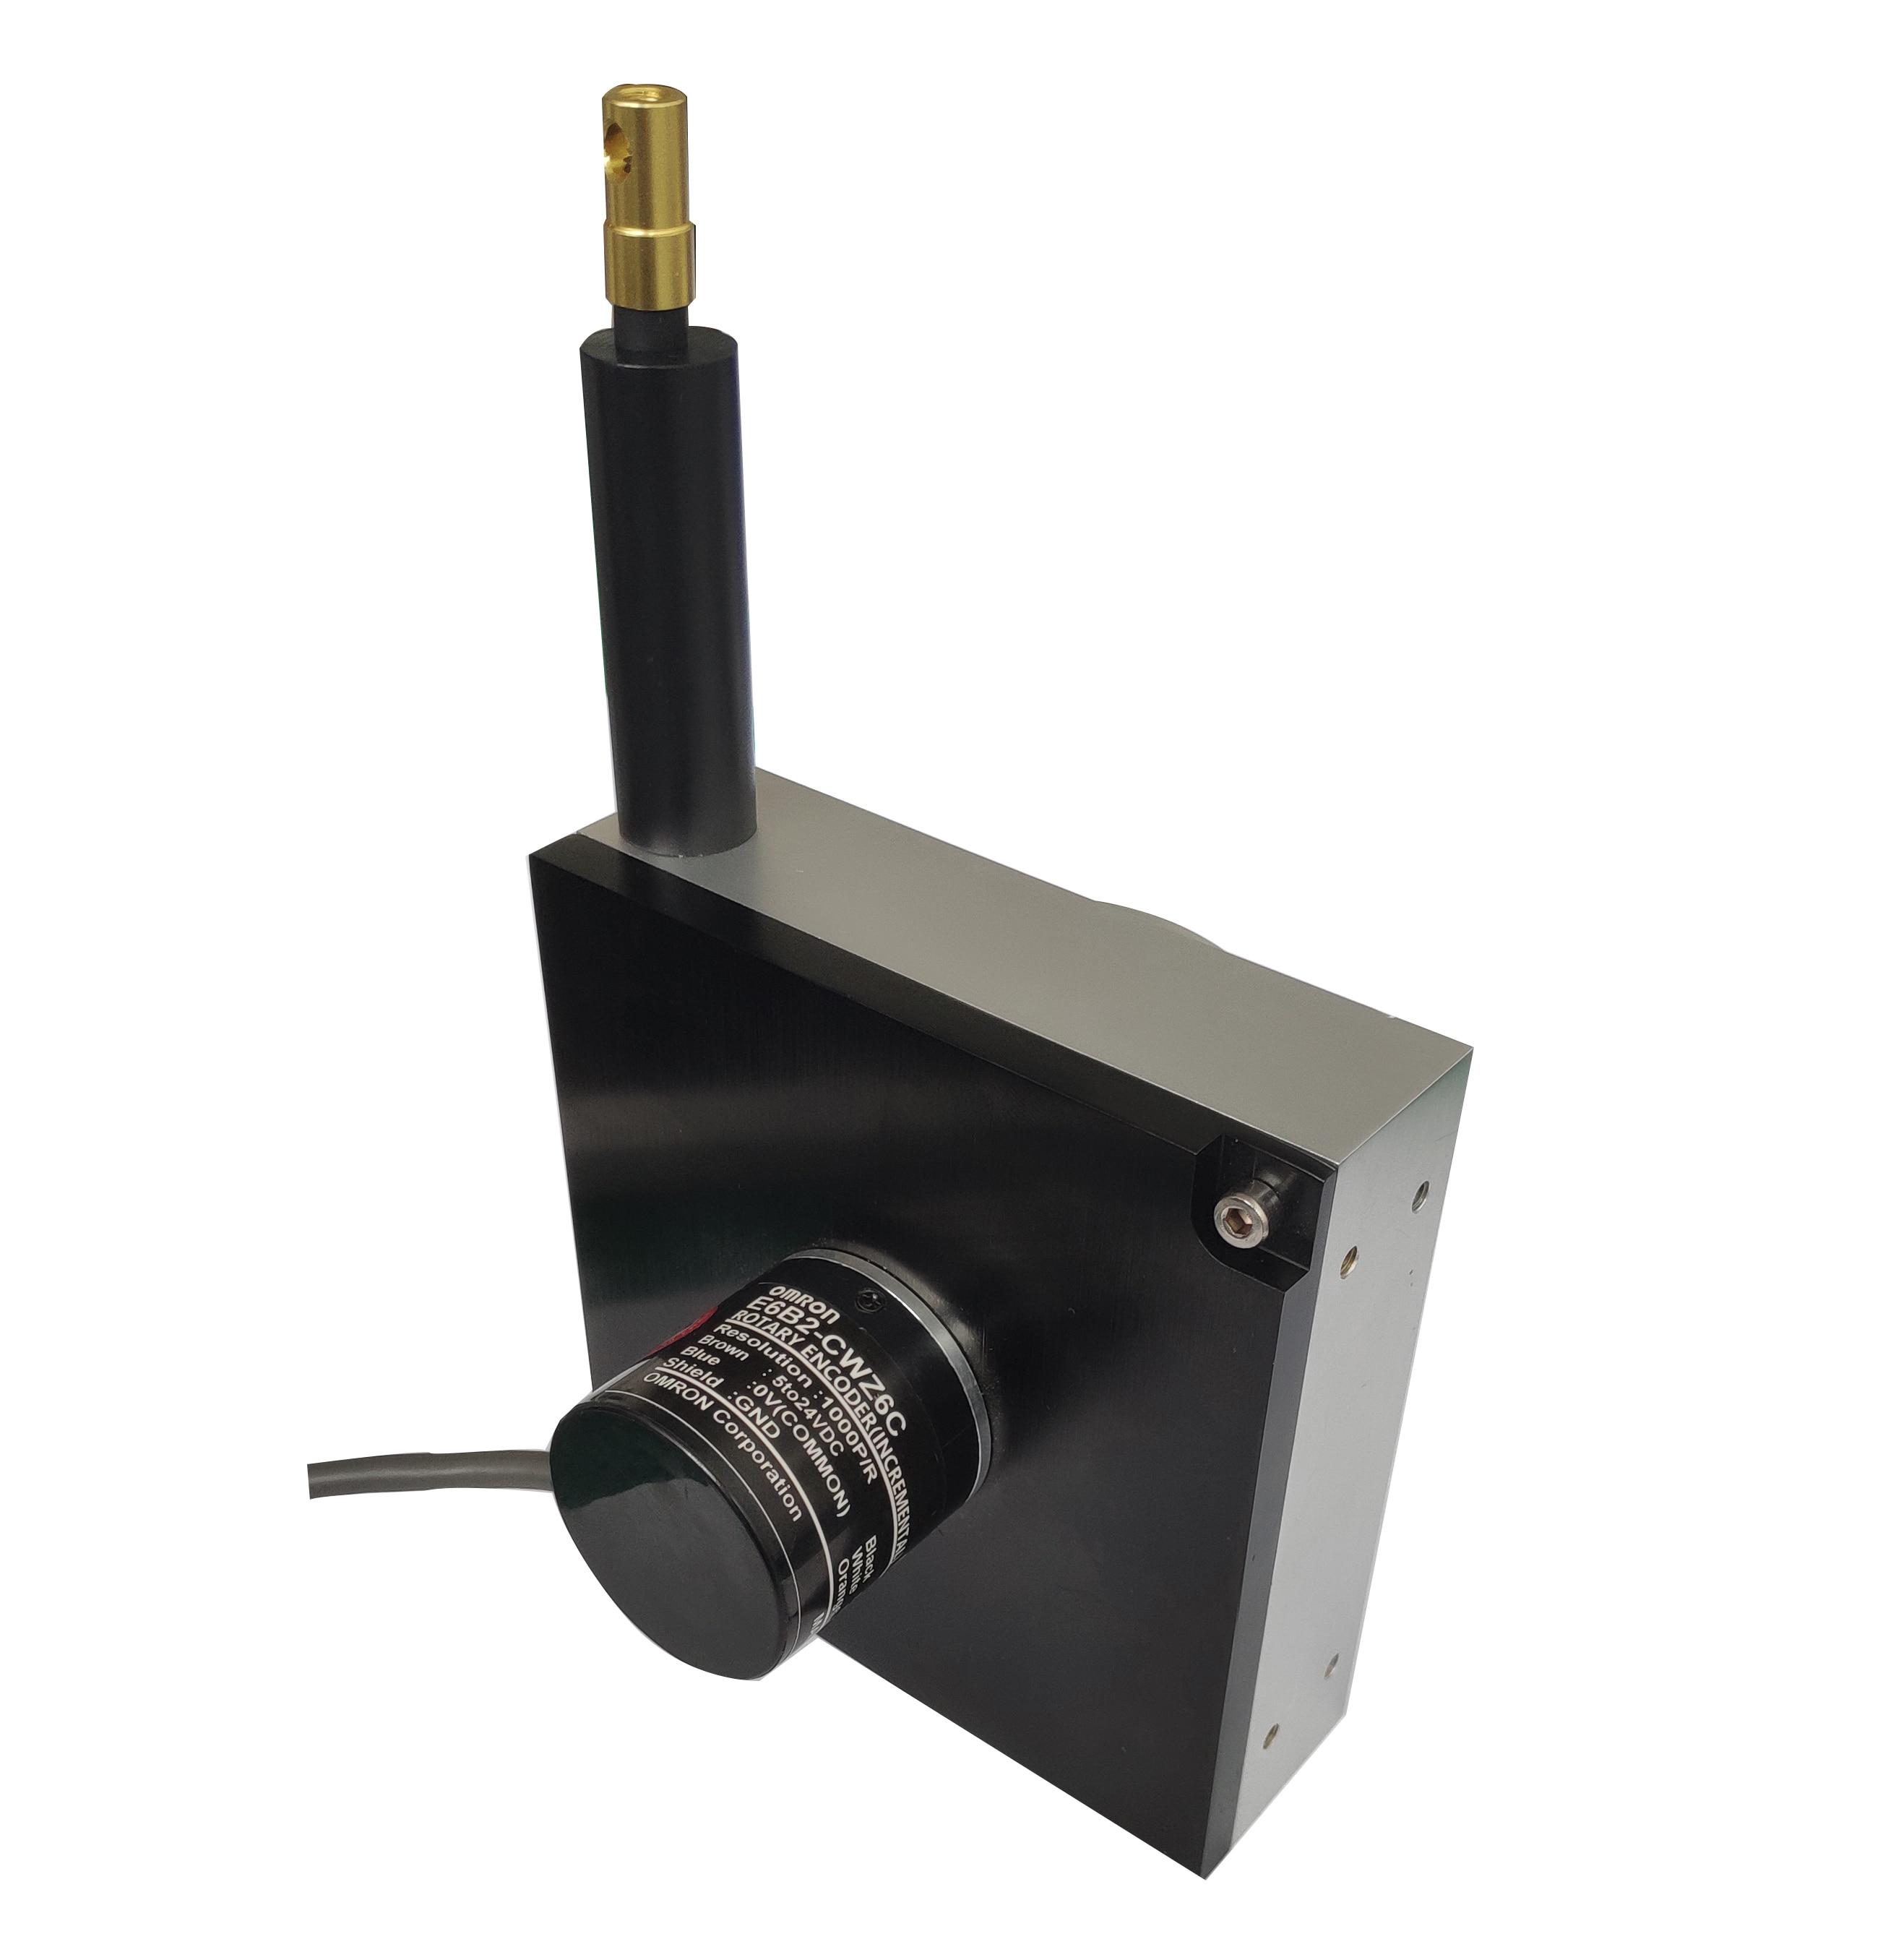 Encoder Pull Line Displacement Encoder Pull Rope Displacement Sensor High Precision Measurement 2000p